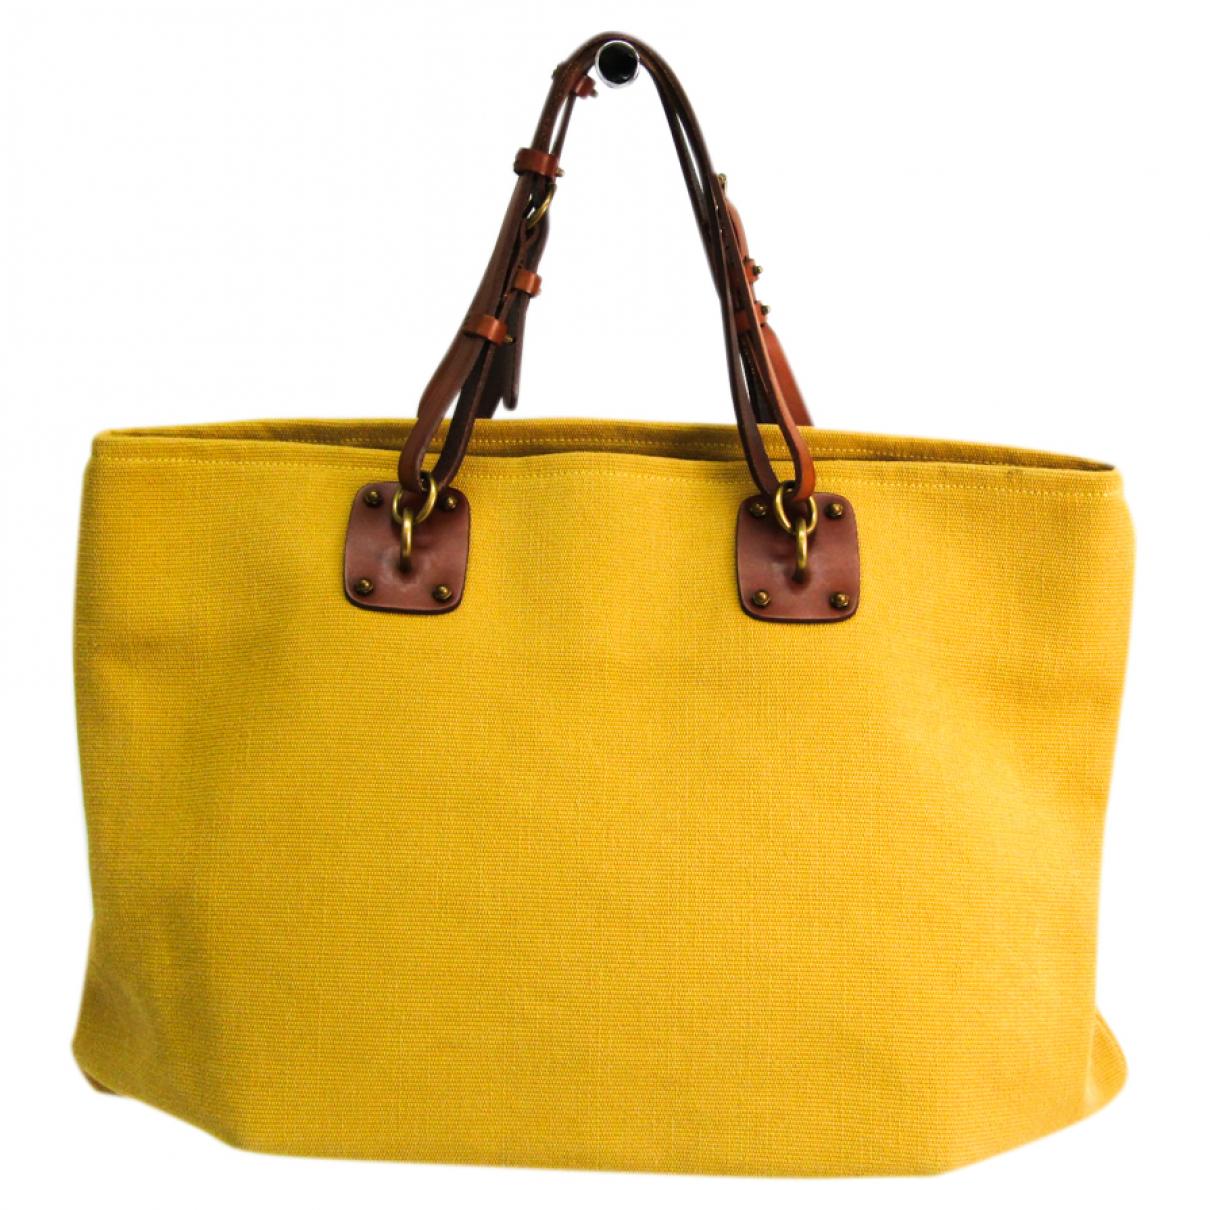 Bottega Veneta N Yellow Leather handbag for Women N